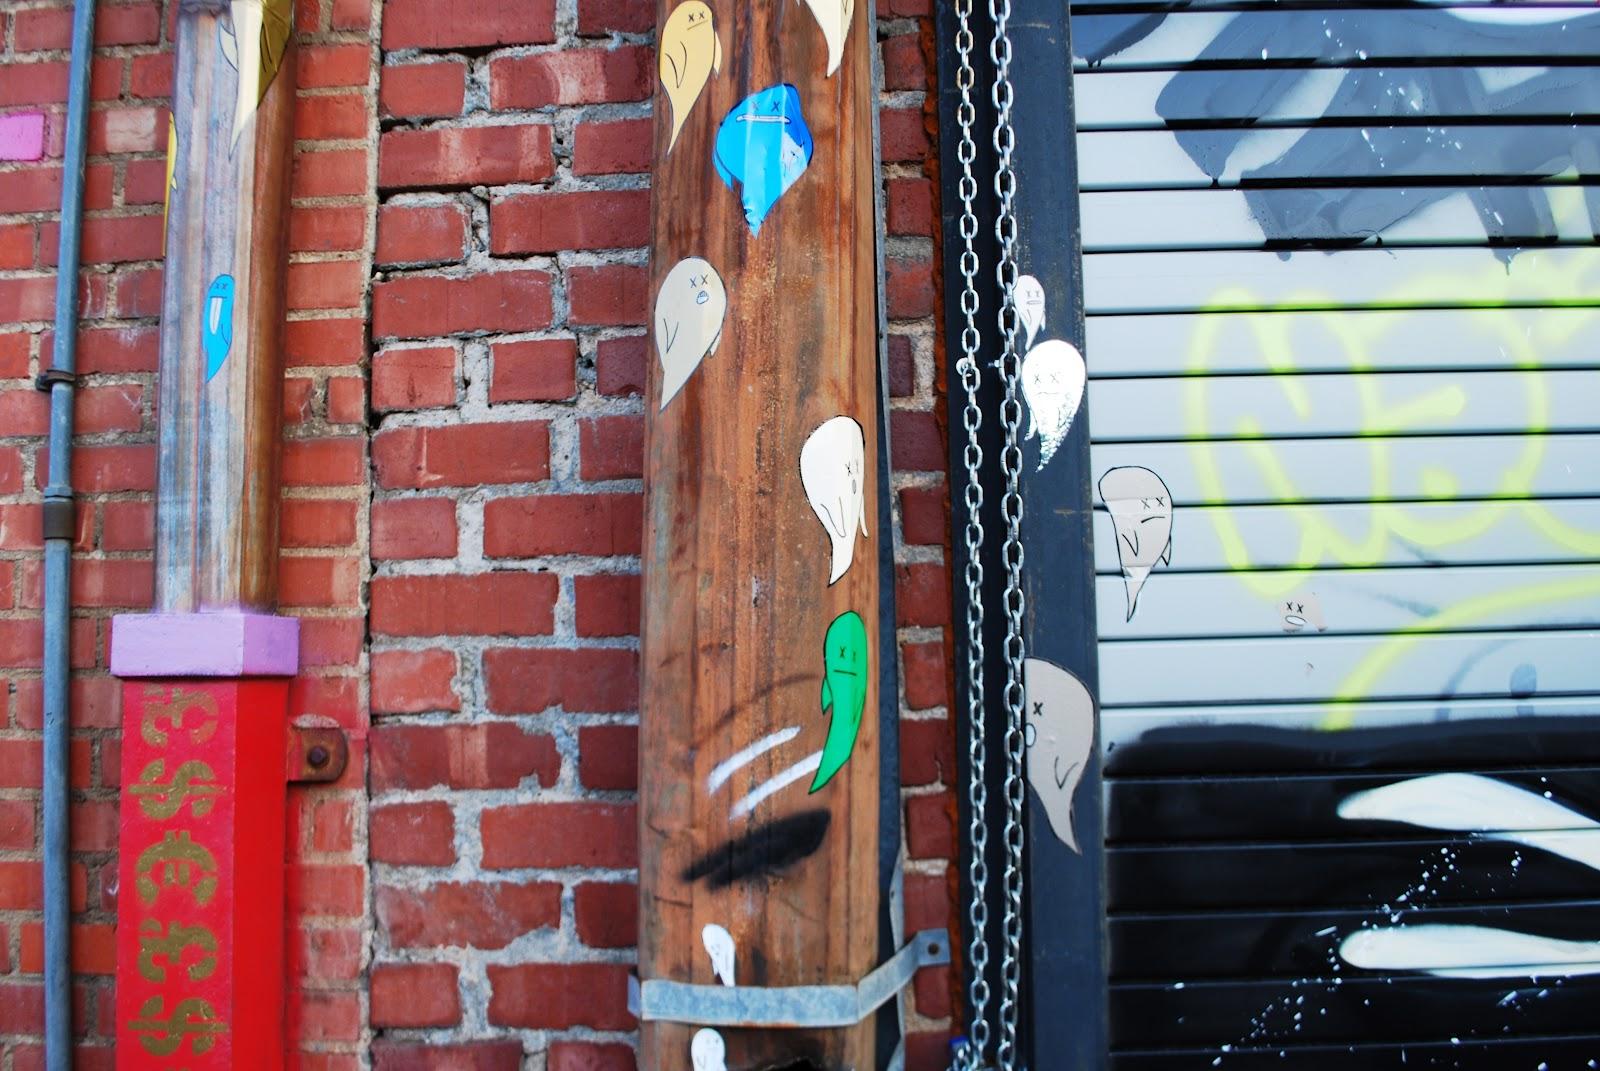 Graffiti Stickers on a light pole